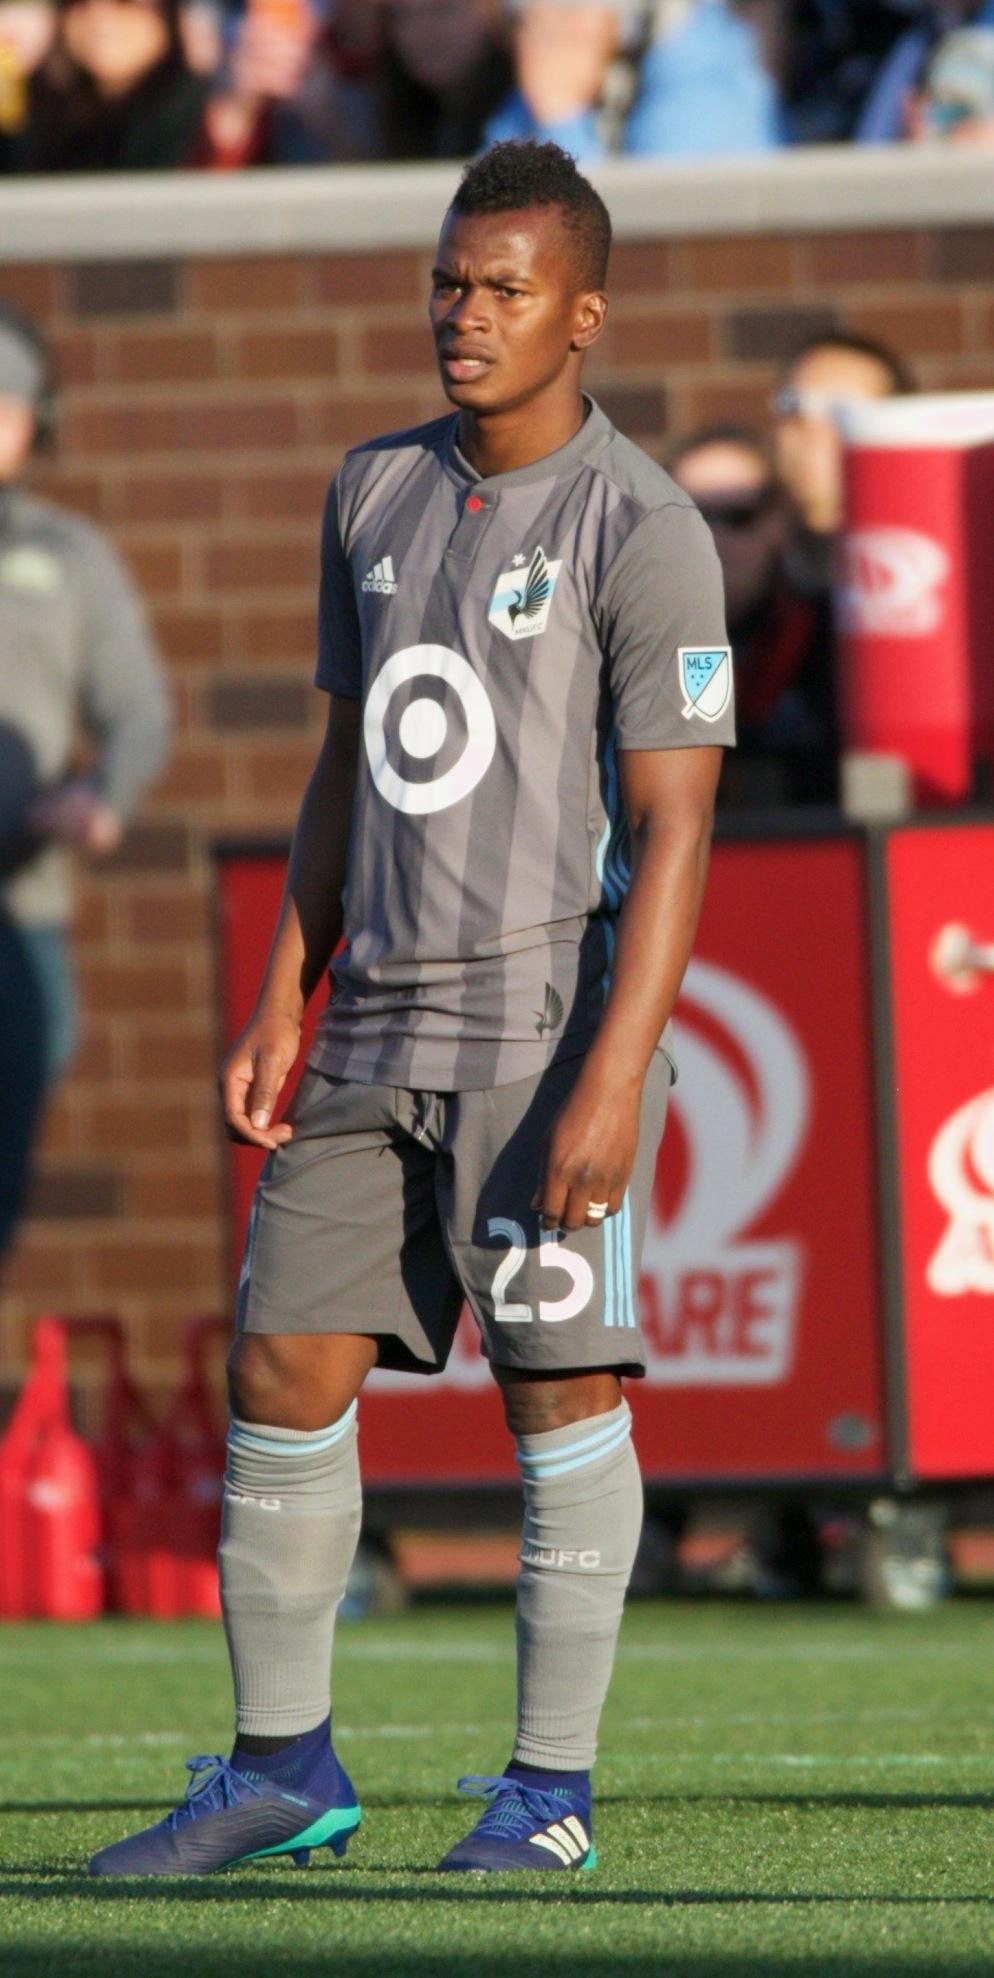 Quintero playing for [[Minnesota United FC|Minnesota United]] in 2018